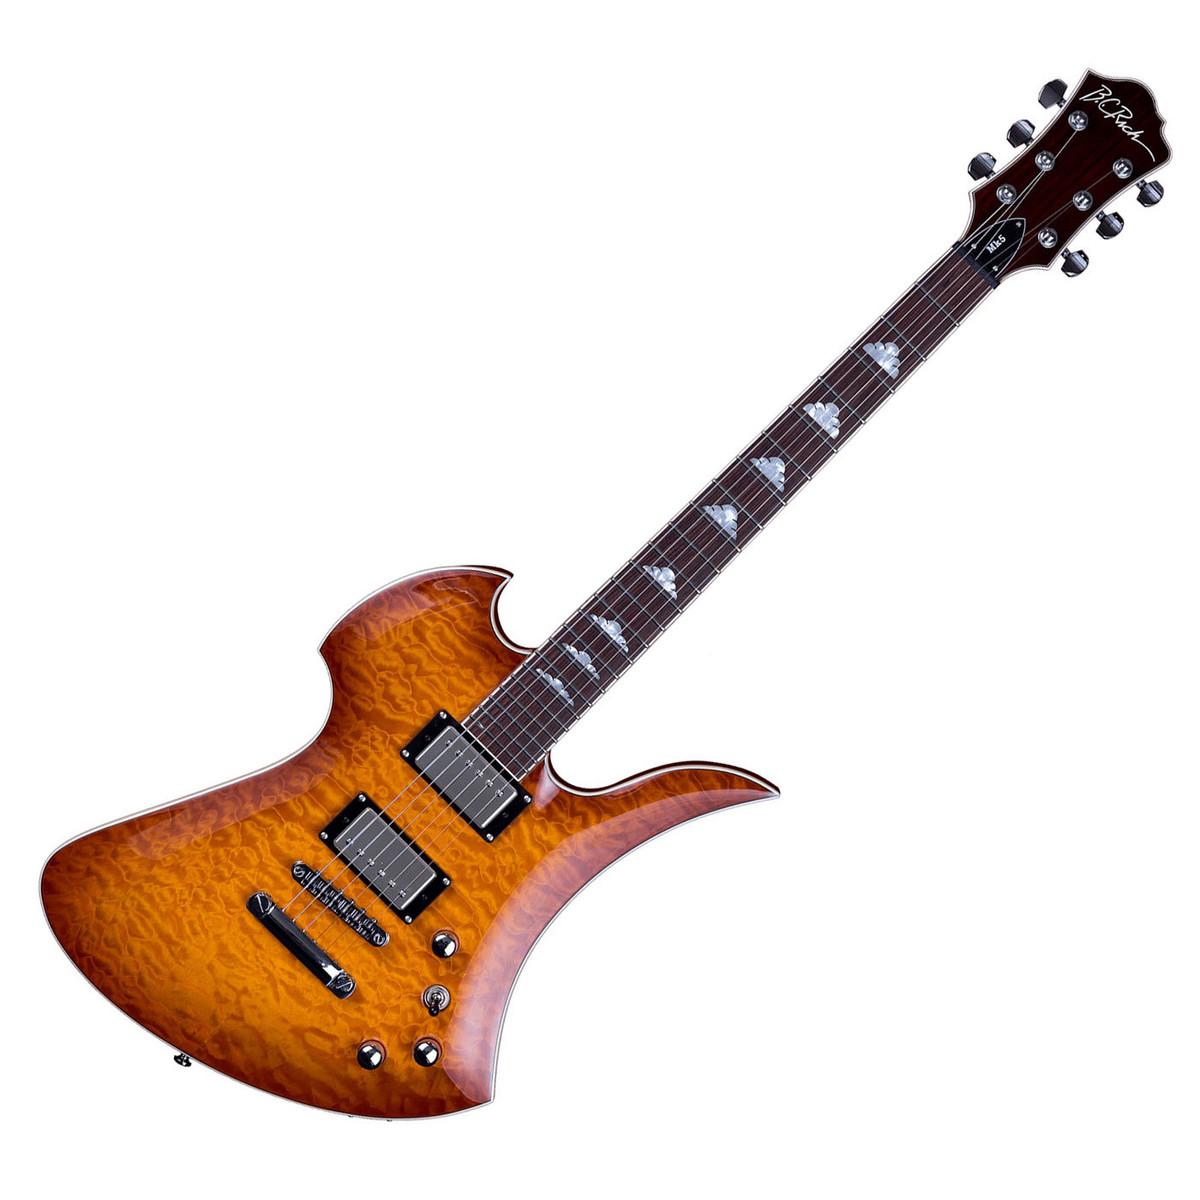 bc rich mockingbird mk5 guitare avec tr molo amber burst. Black Bedroom Furniture Sets. Home Design Ideas